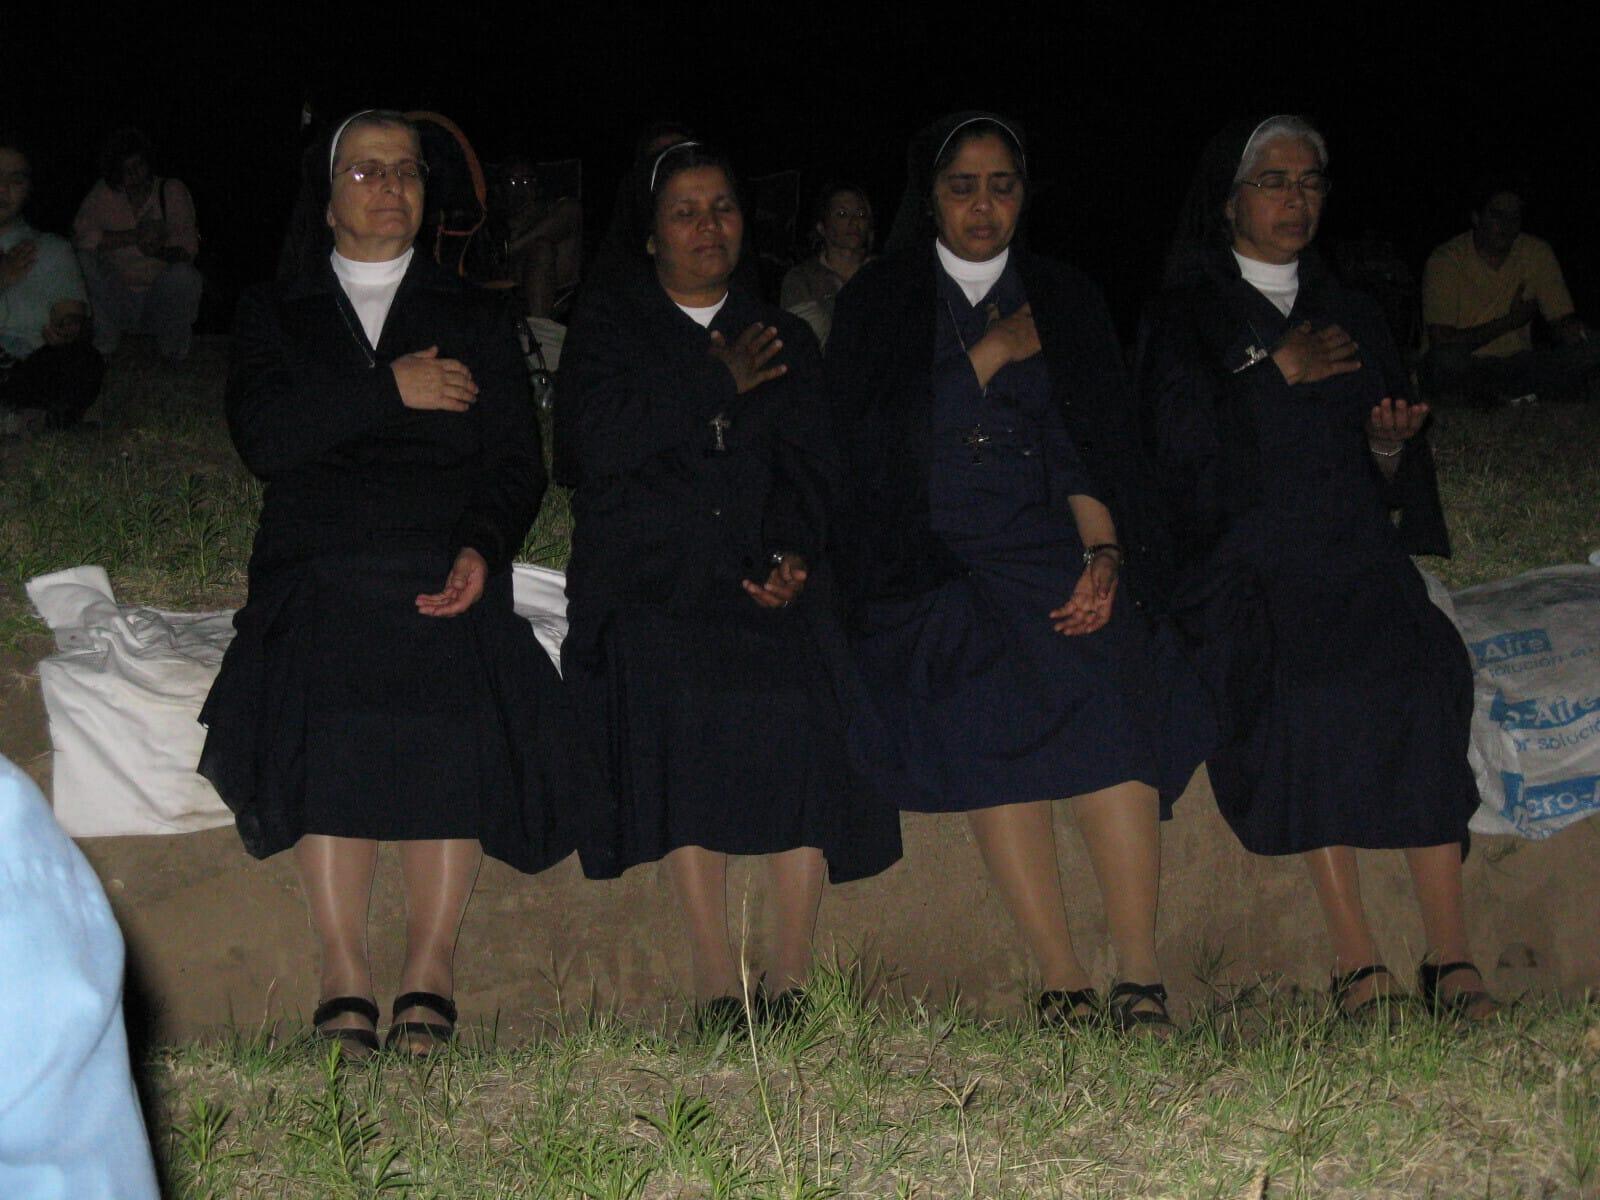 nuns-gettting-self-realization at a sahaja yoga meditation public program in Brazil